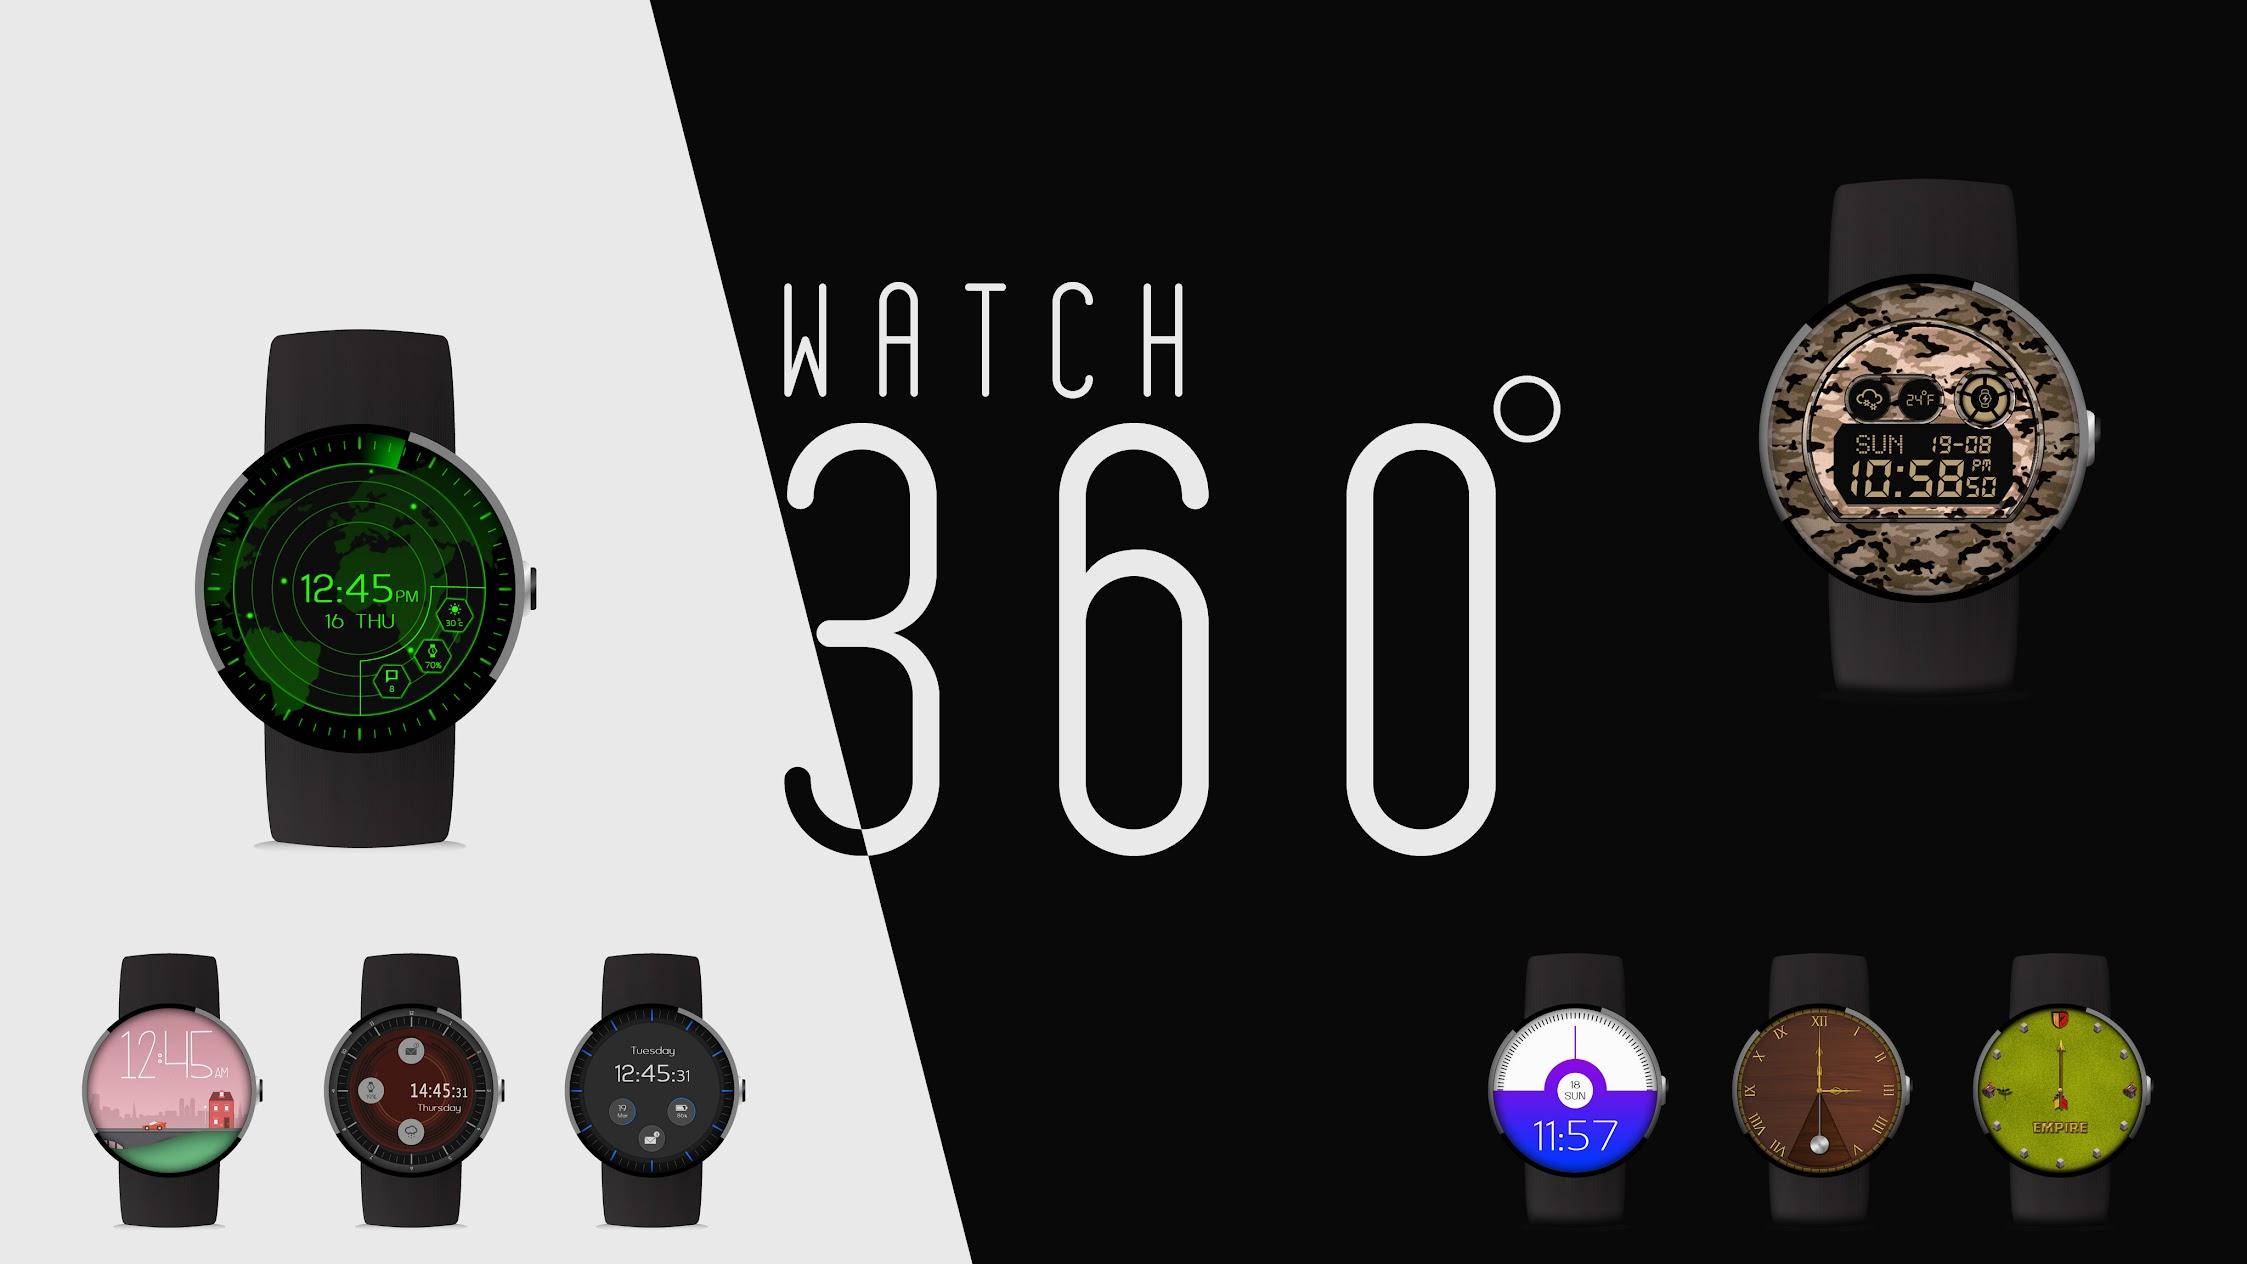 Watch 360